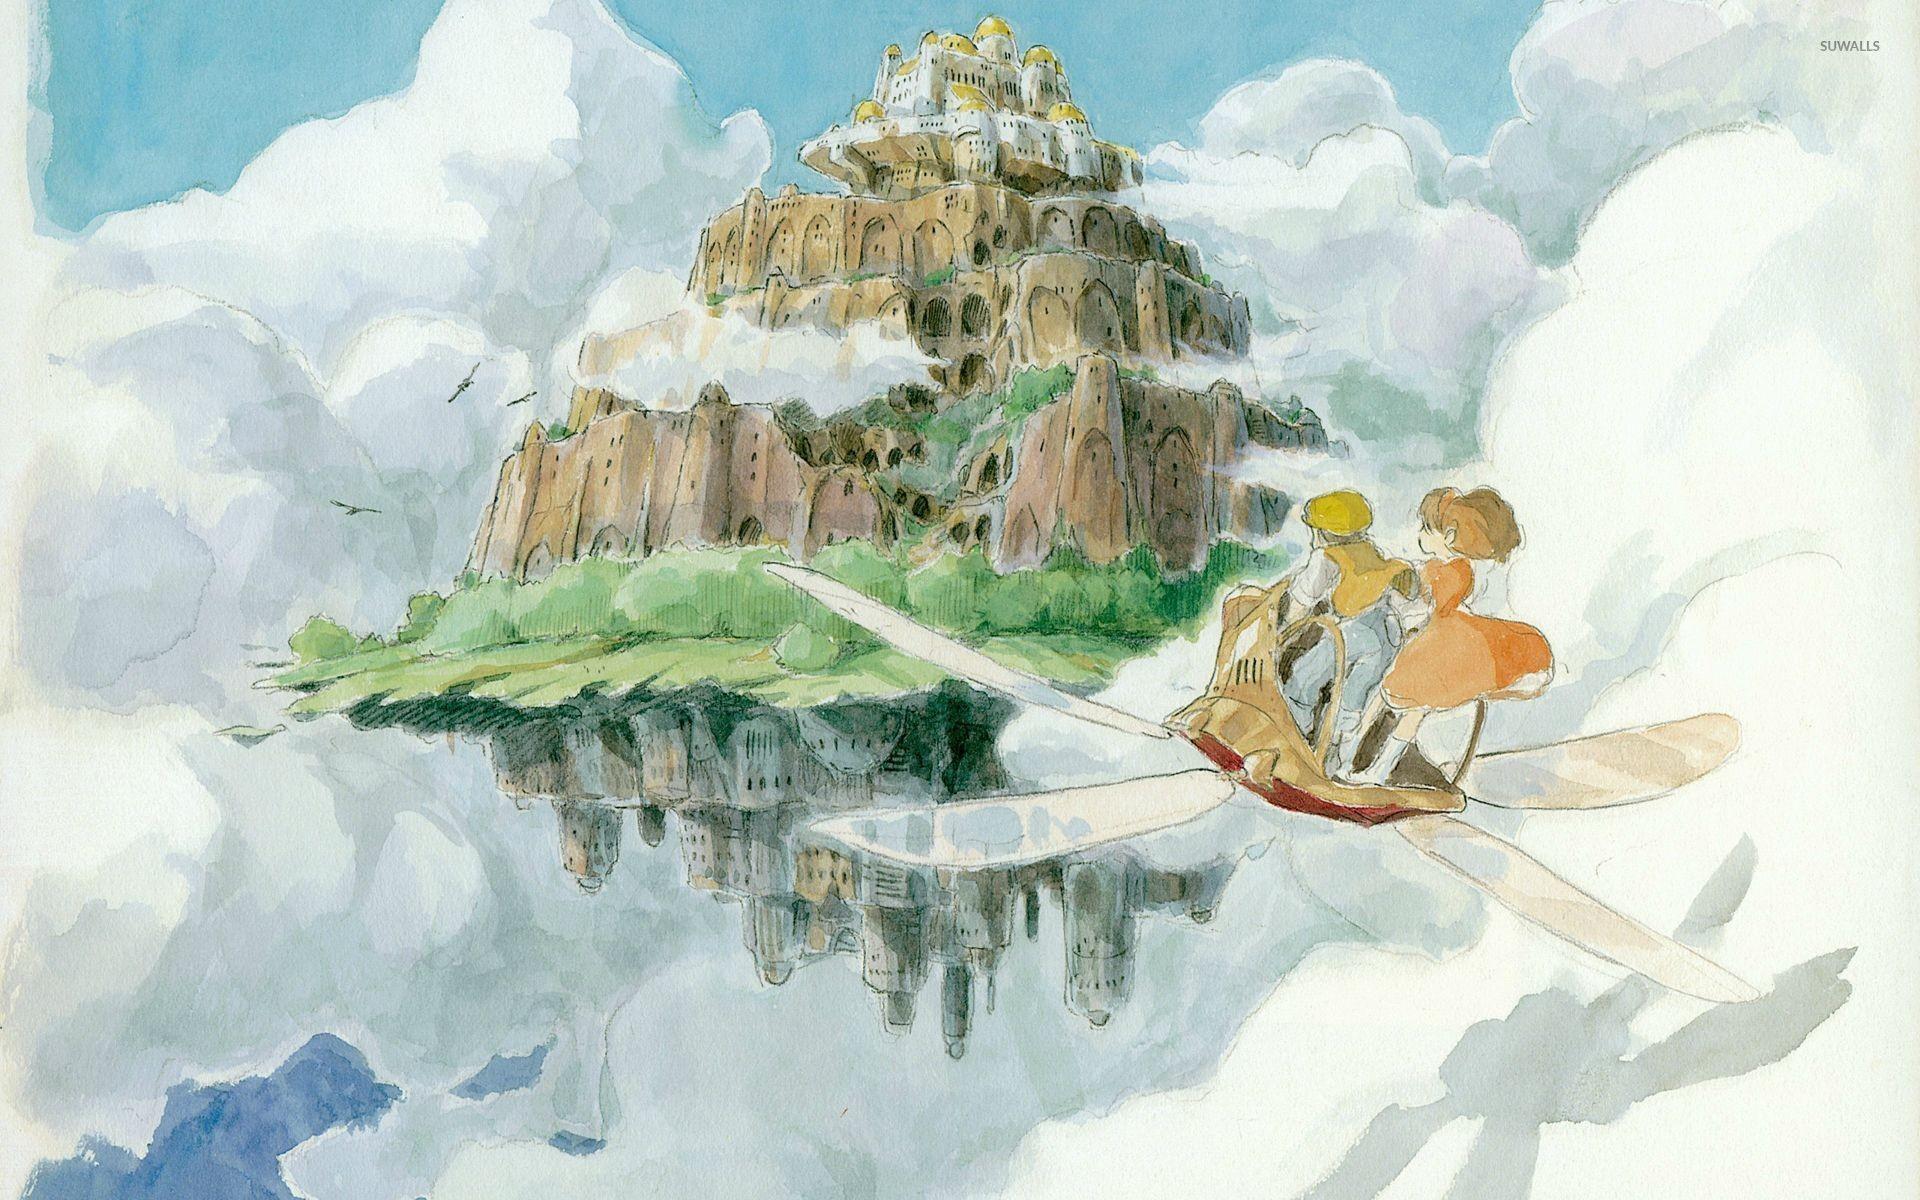 Sheeta and Pazu in Castle in the Sky wallpaper jpg